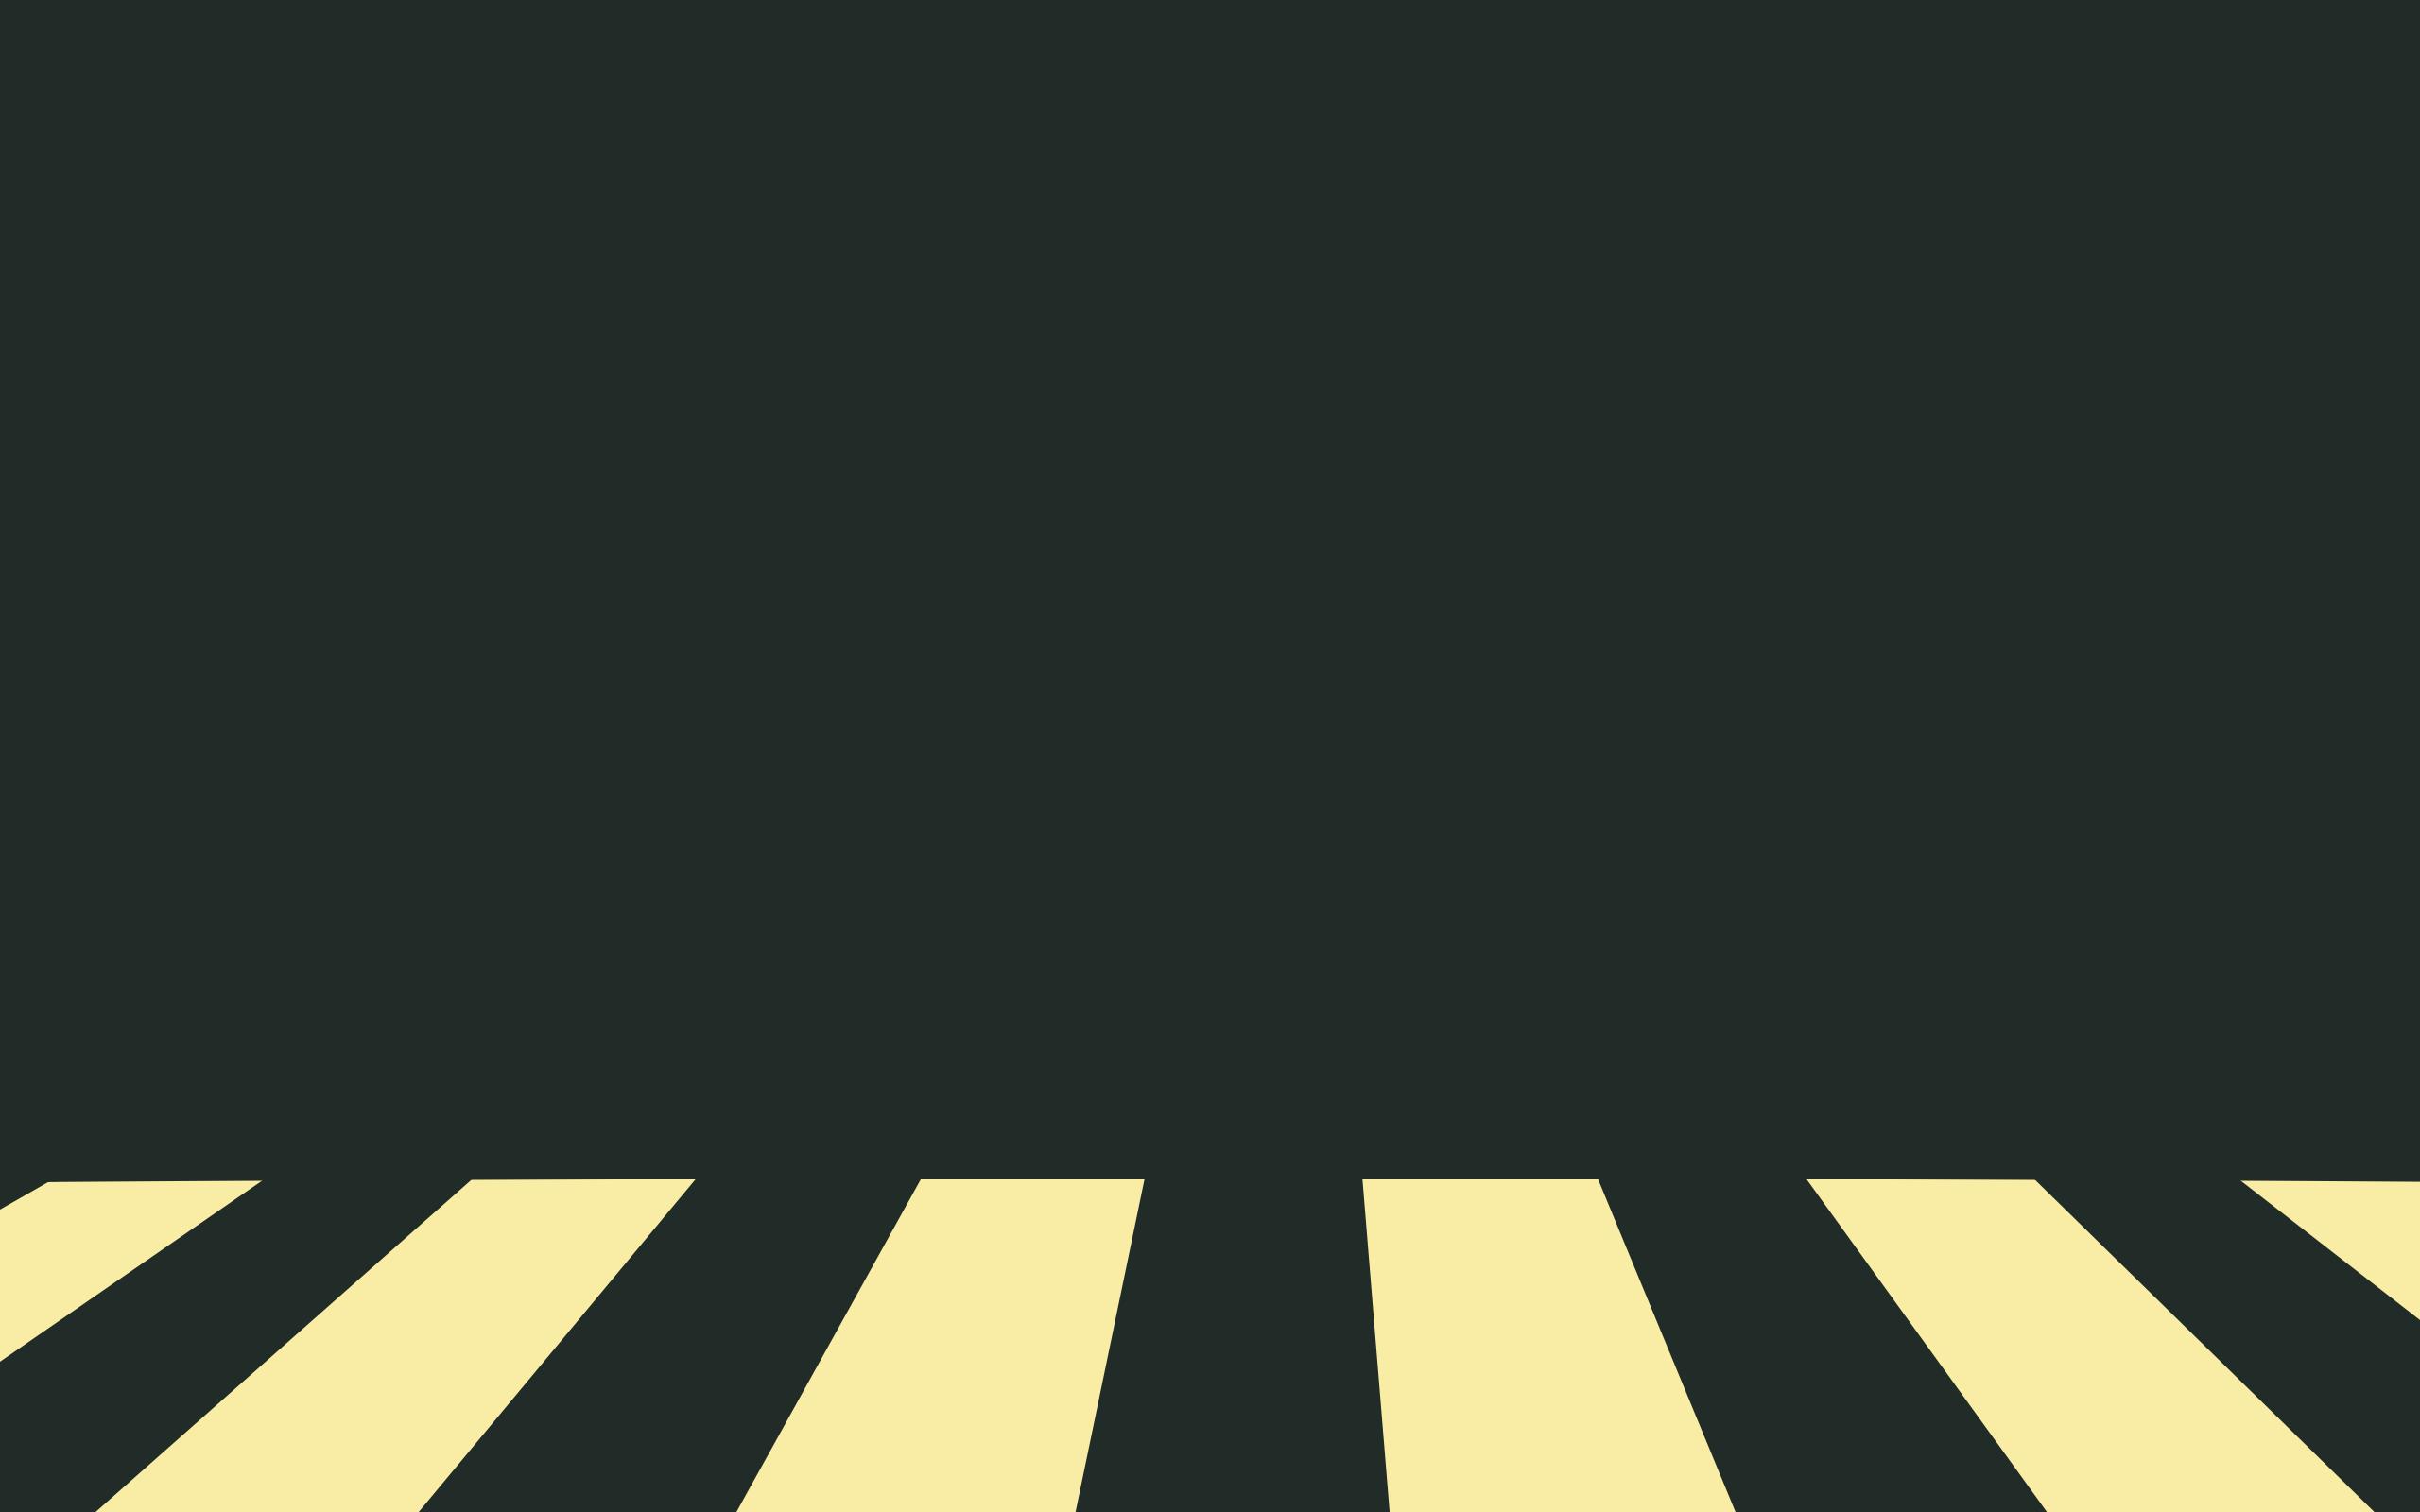 minimalist backgrounds wallpaper cave